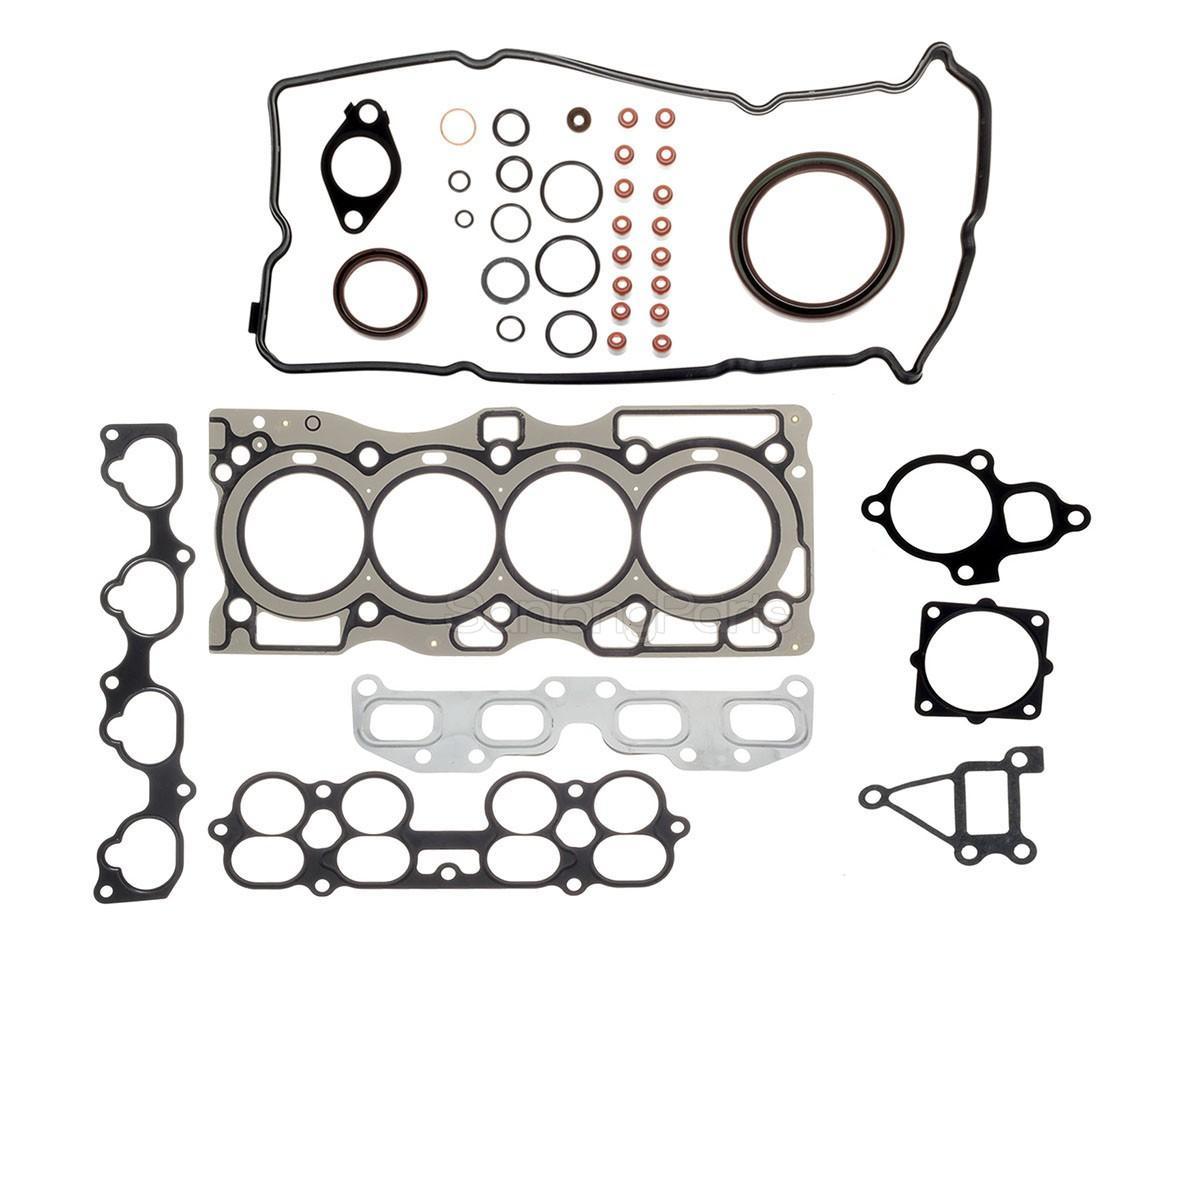 Fits Nissan Altima Sentra SER 2002-2006 2.5 Cylinder Head